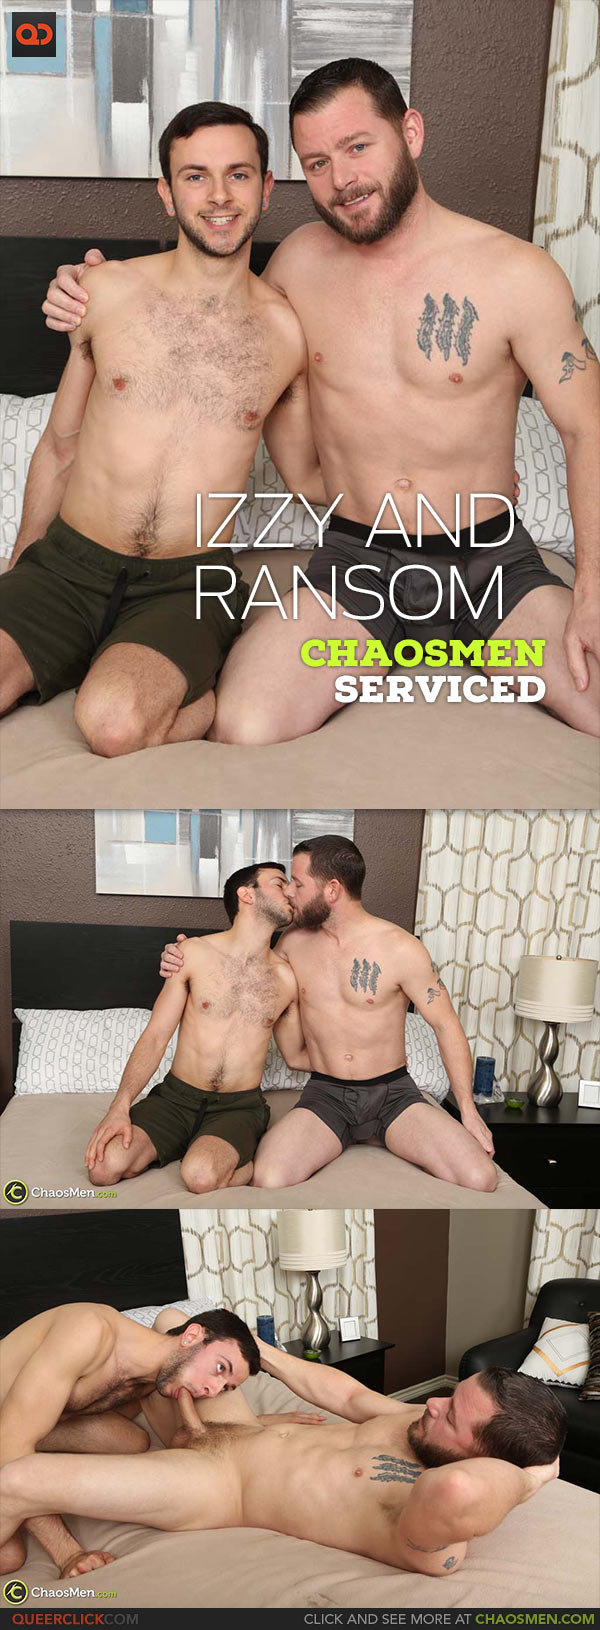 ChaosMen: Izzy Danger and Ransom - Serviced